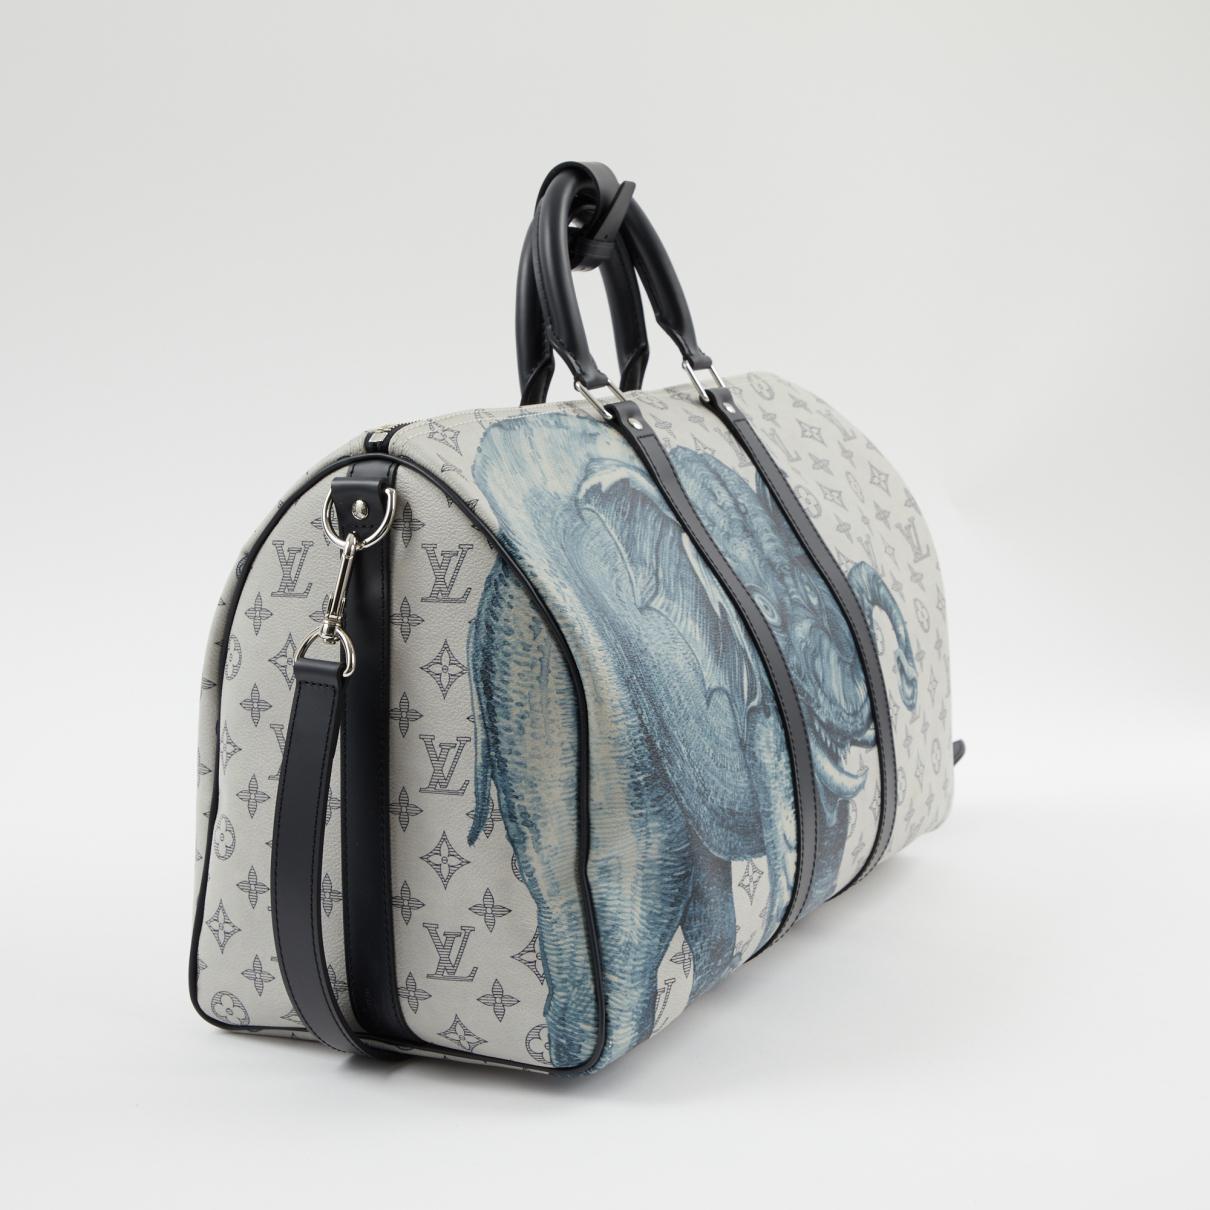 8cb825798717 Louis Vuitton - Pre-owned White Cloth Bags for Men - Lyst. View fullscreen